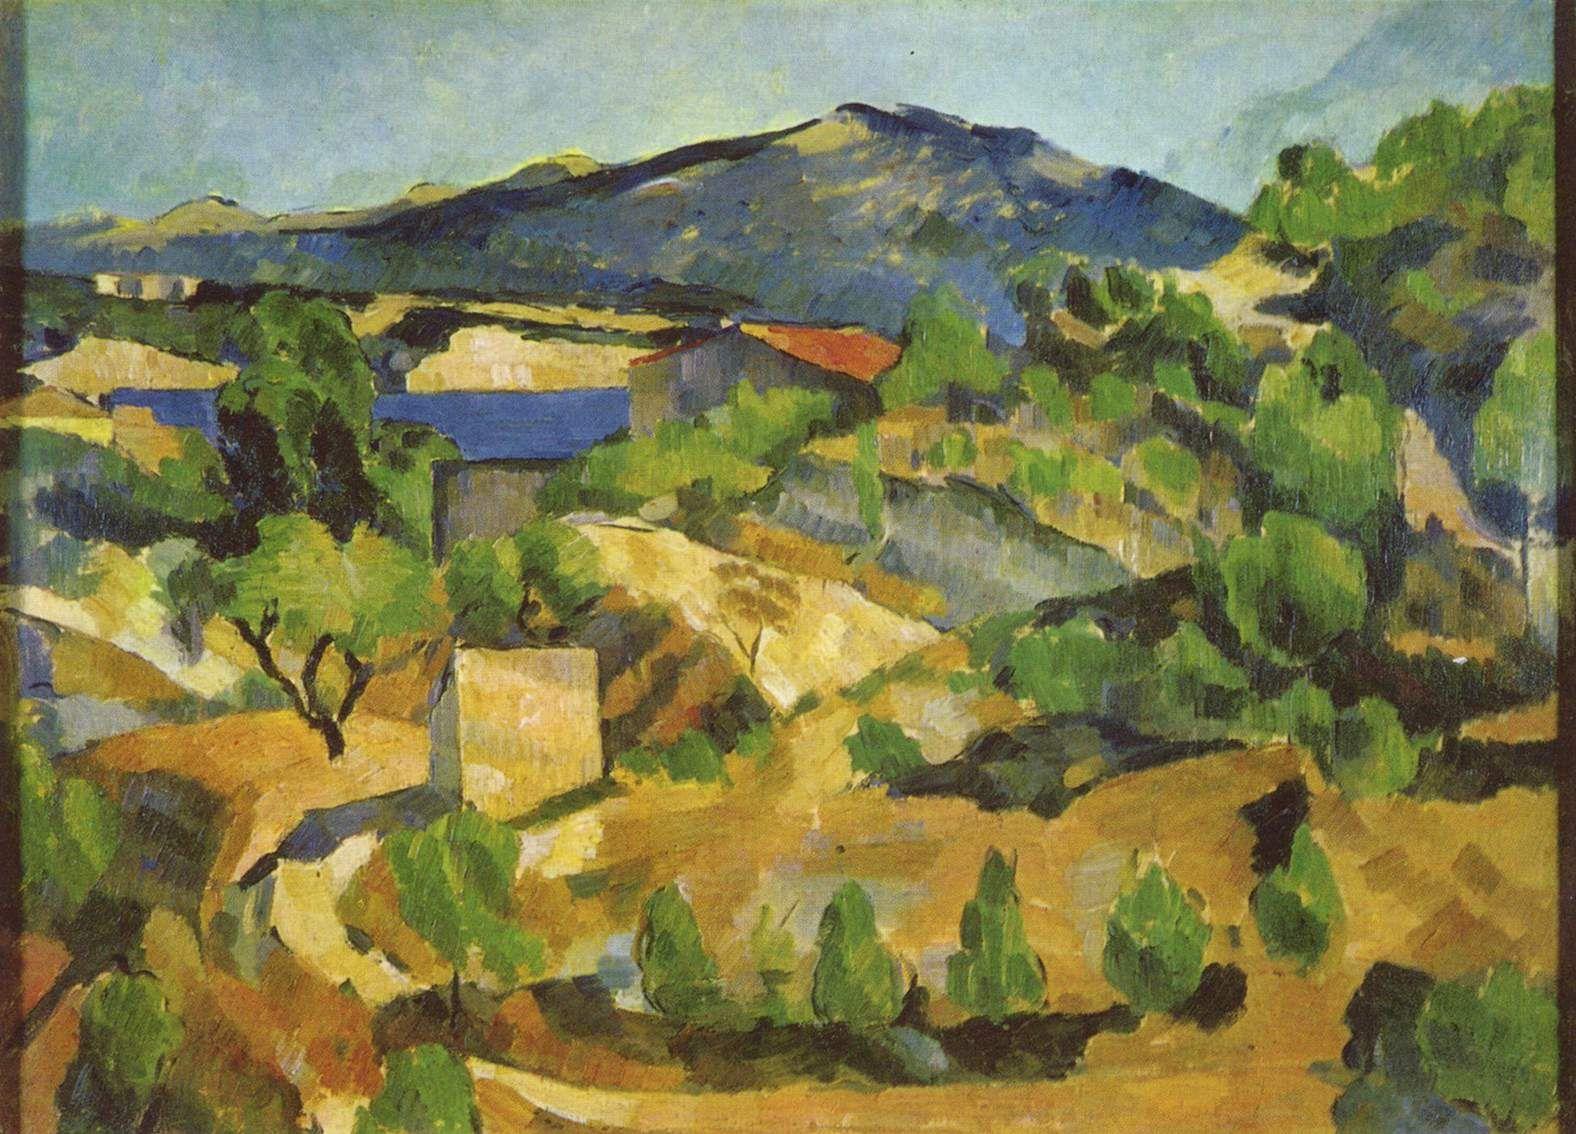 Mountains-in-provence-l-estaque. Paul Cezanne